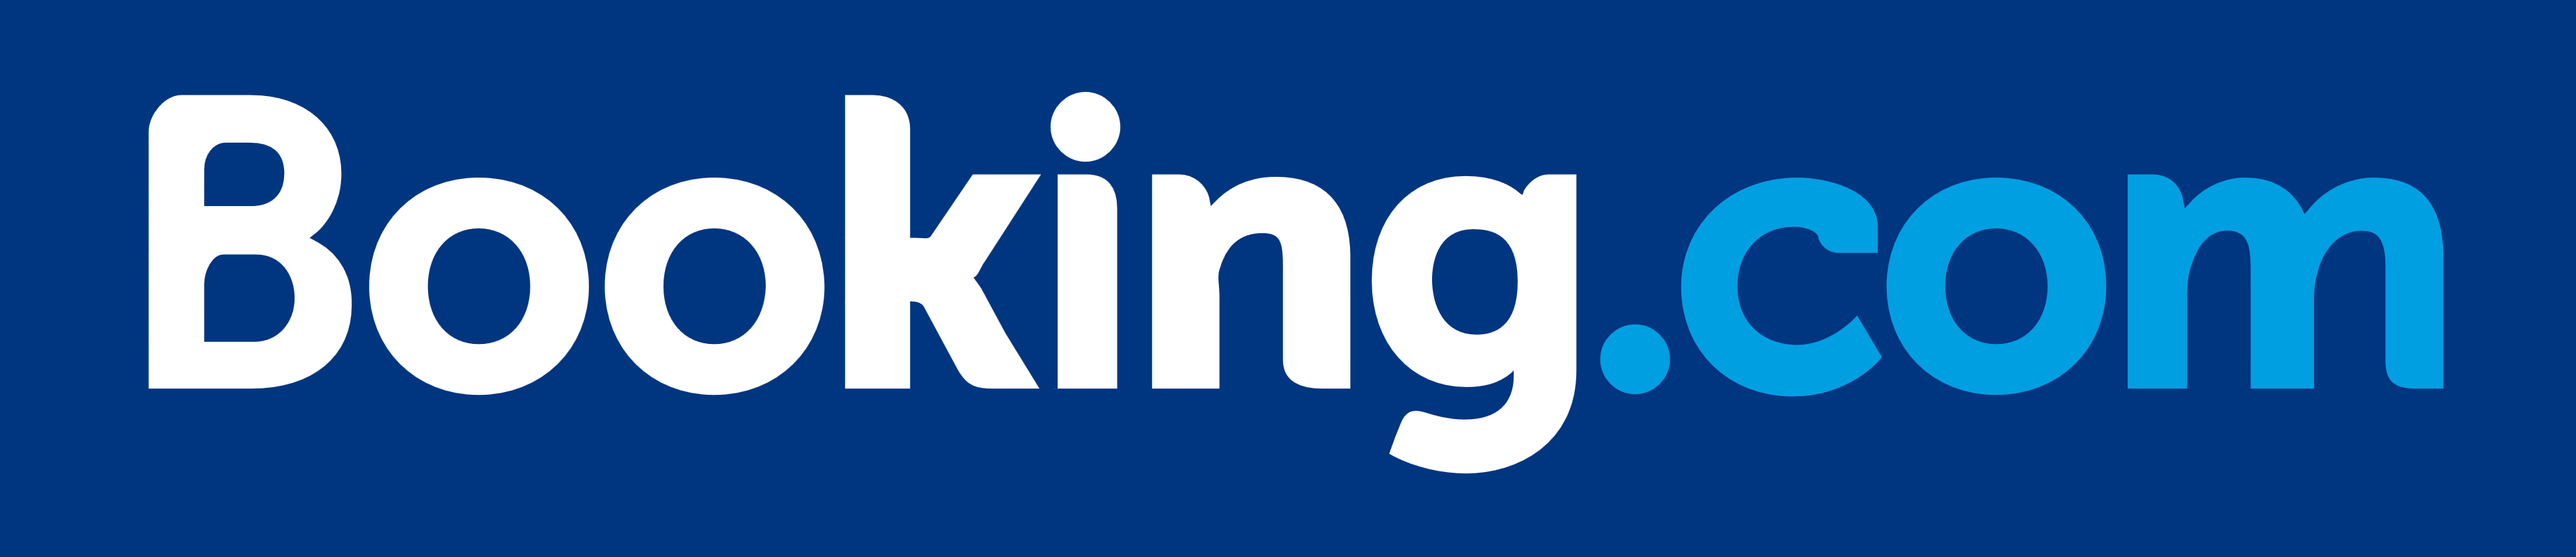 Booking Logo, Logotype - Booking Com, Transparent background PNG HD thumbnail